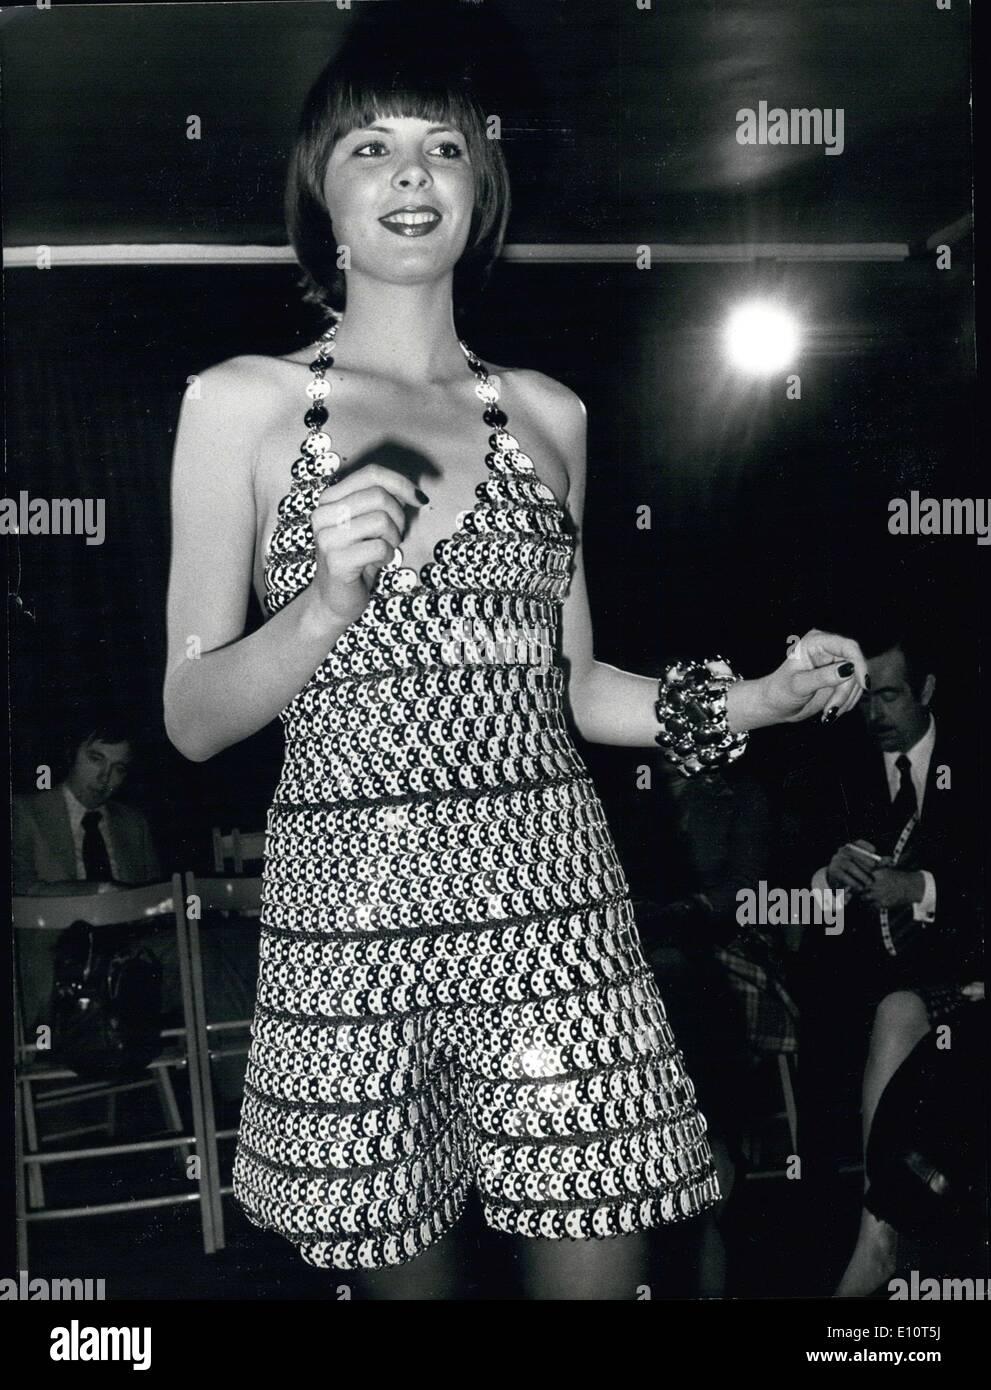 Feb. 01, 1974 - Model Wearing Plastic Black White Dress Pants by Paco Rabanne .c - Stock Image